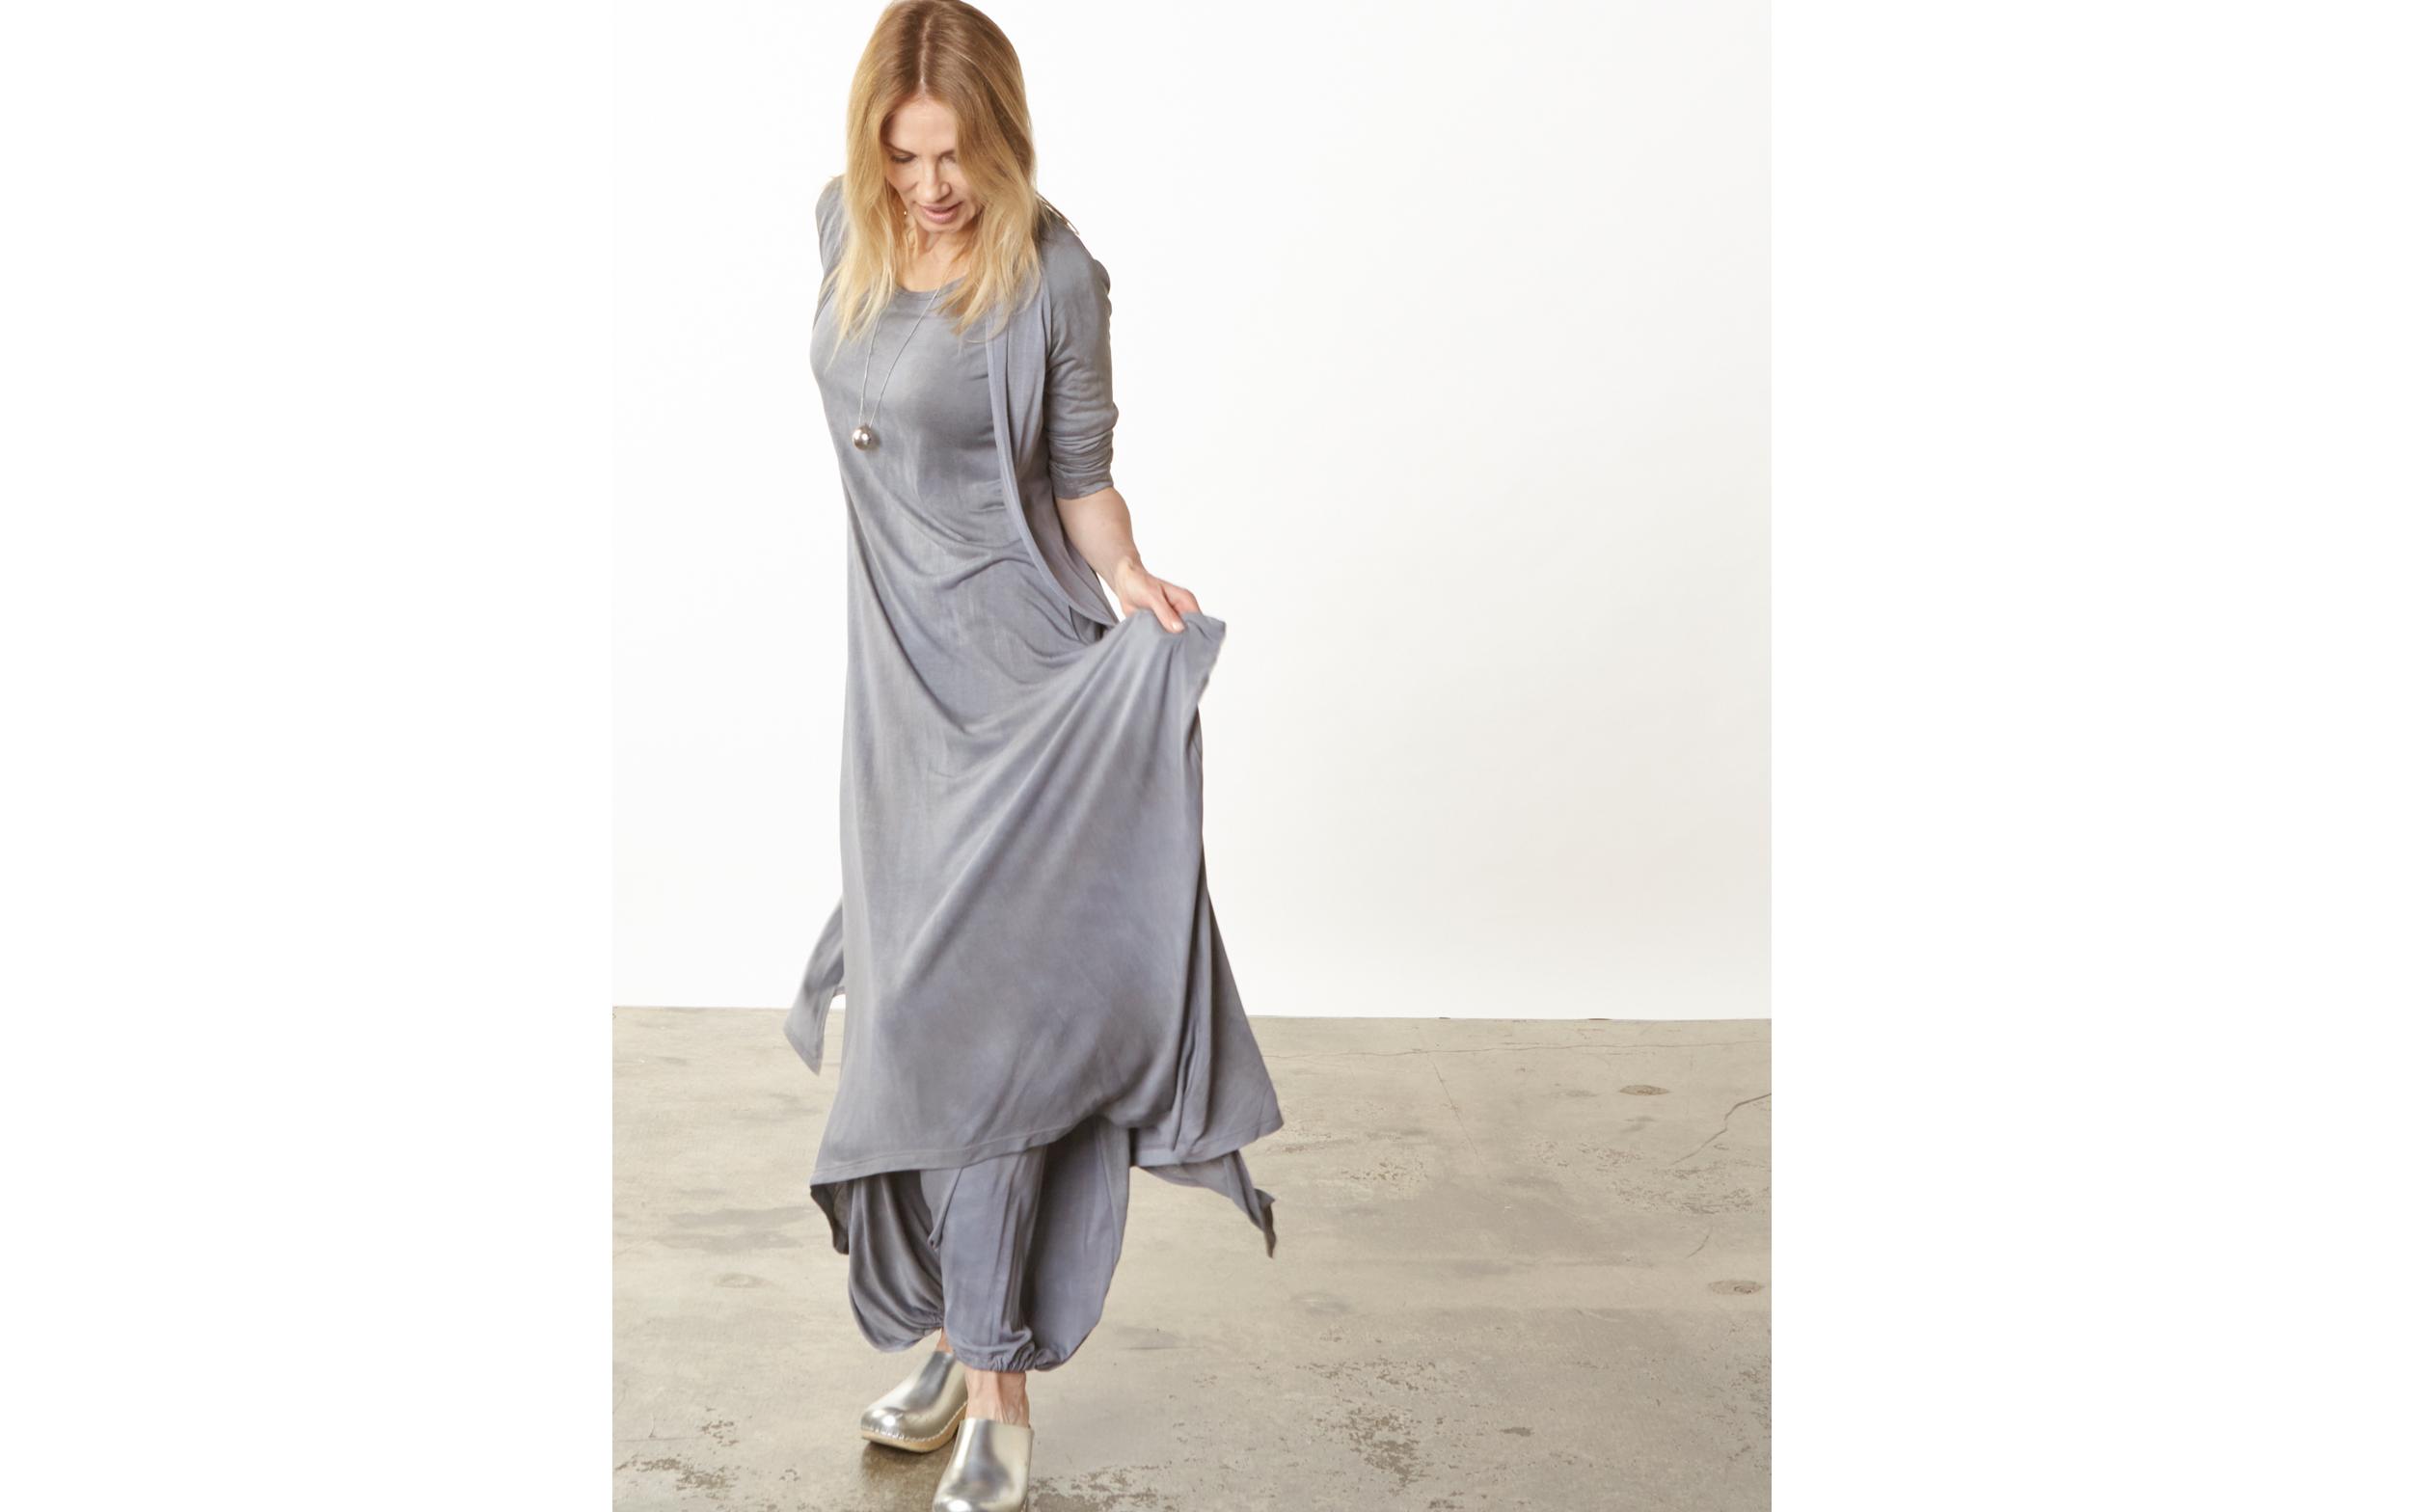 Tristan Cardigan, S/S Chelsea Dress, Gaucho Pant in Grey Italian Tie Dye Viscose Jersey